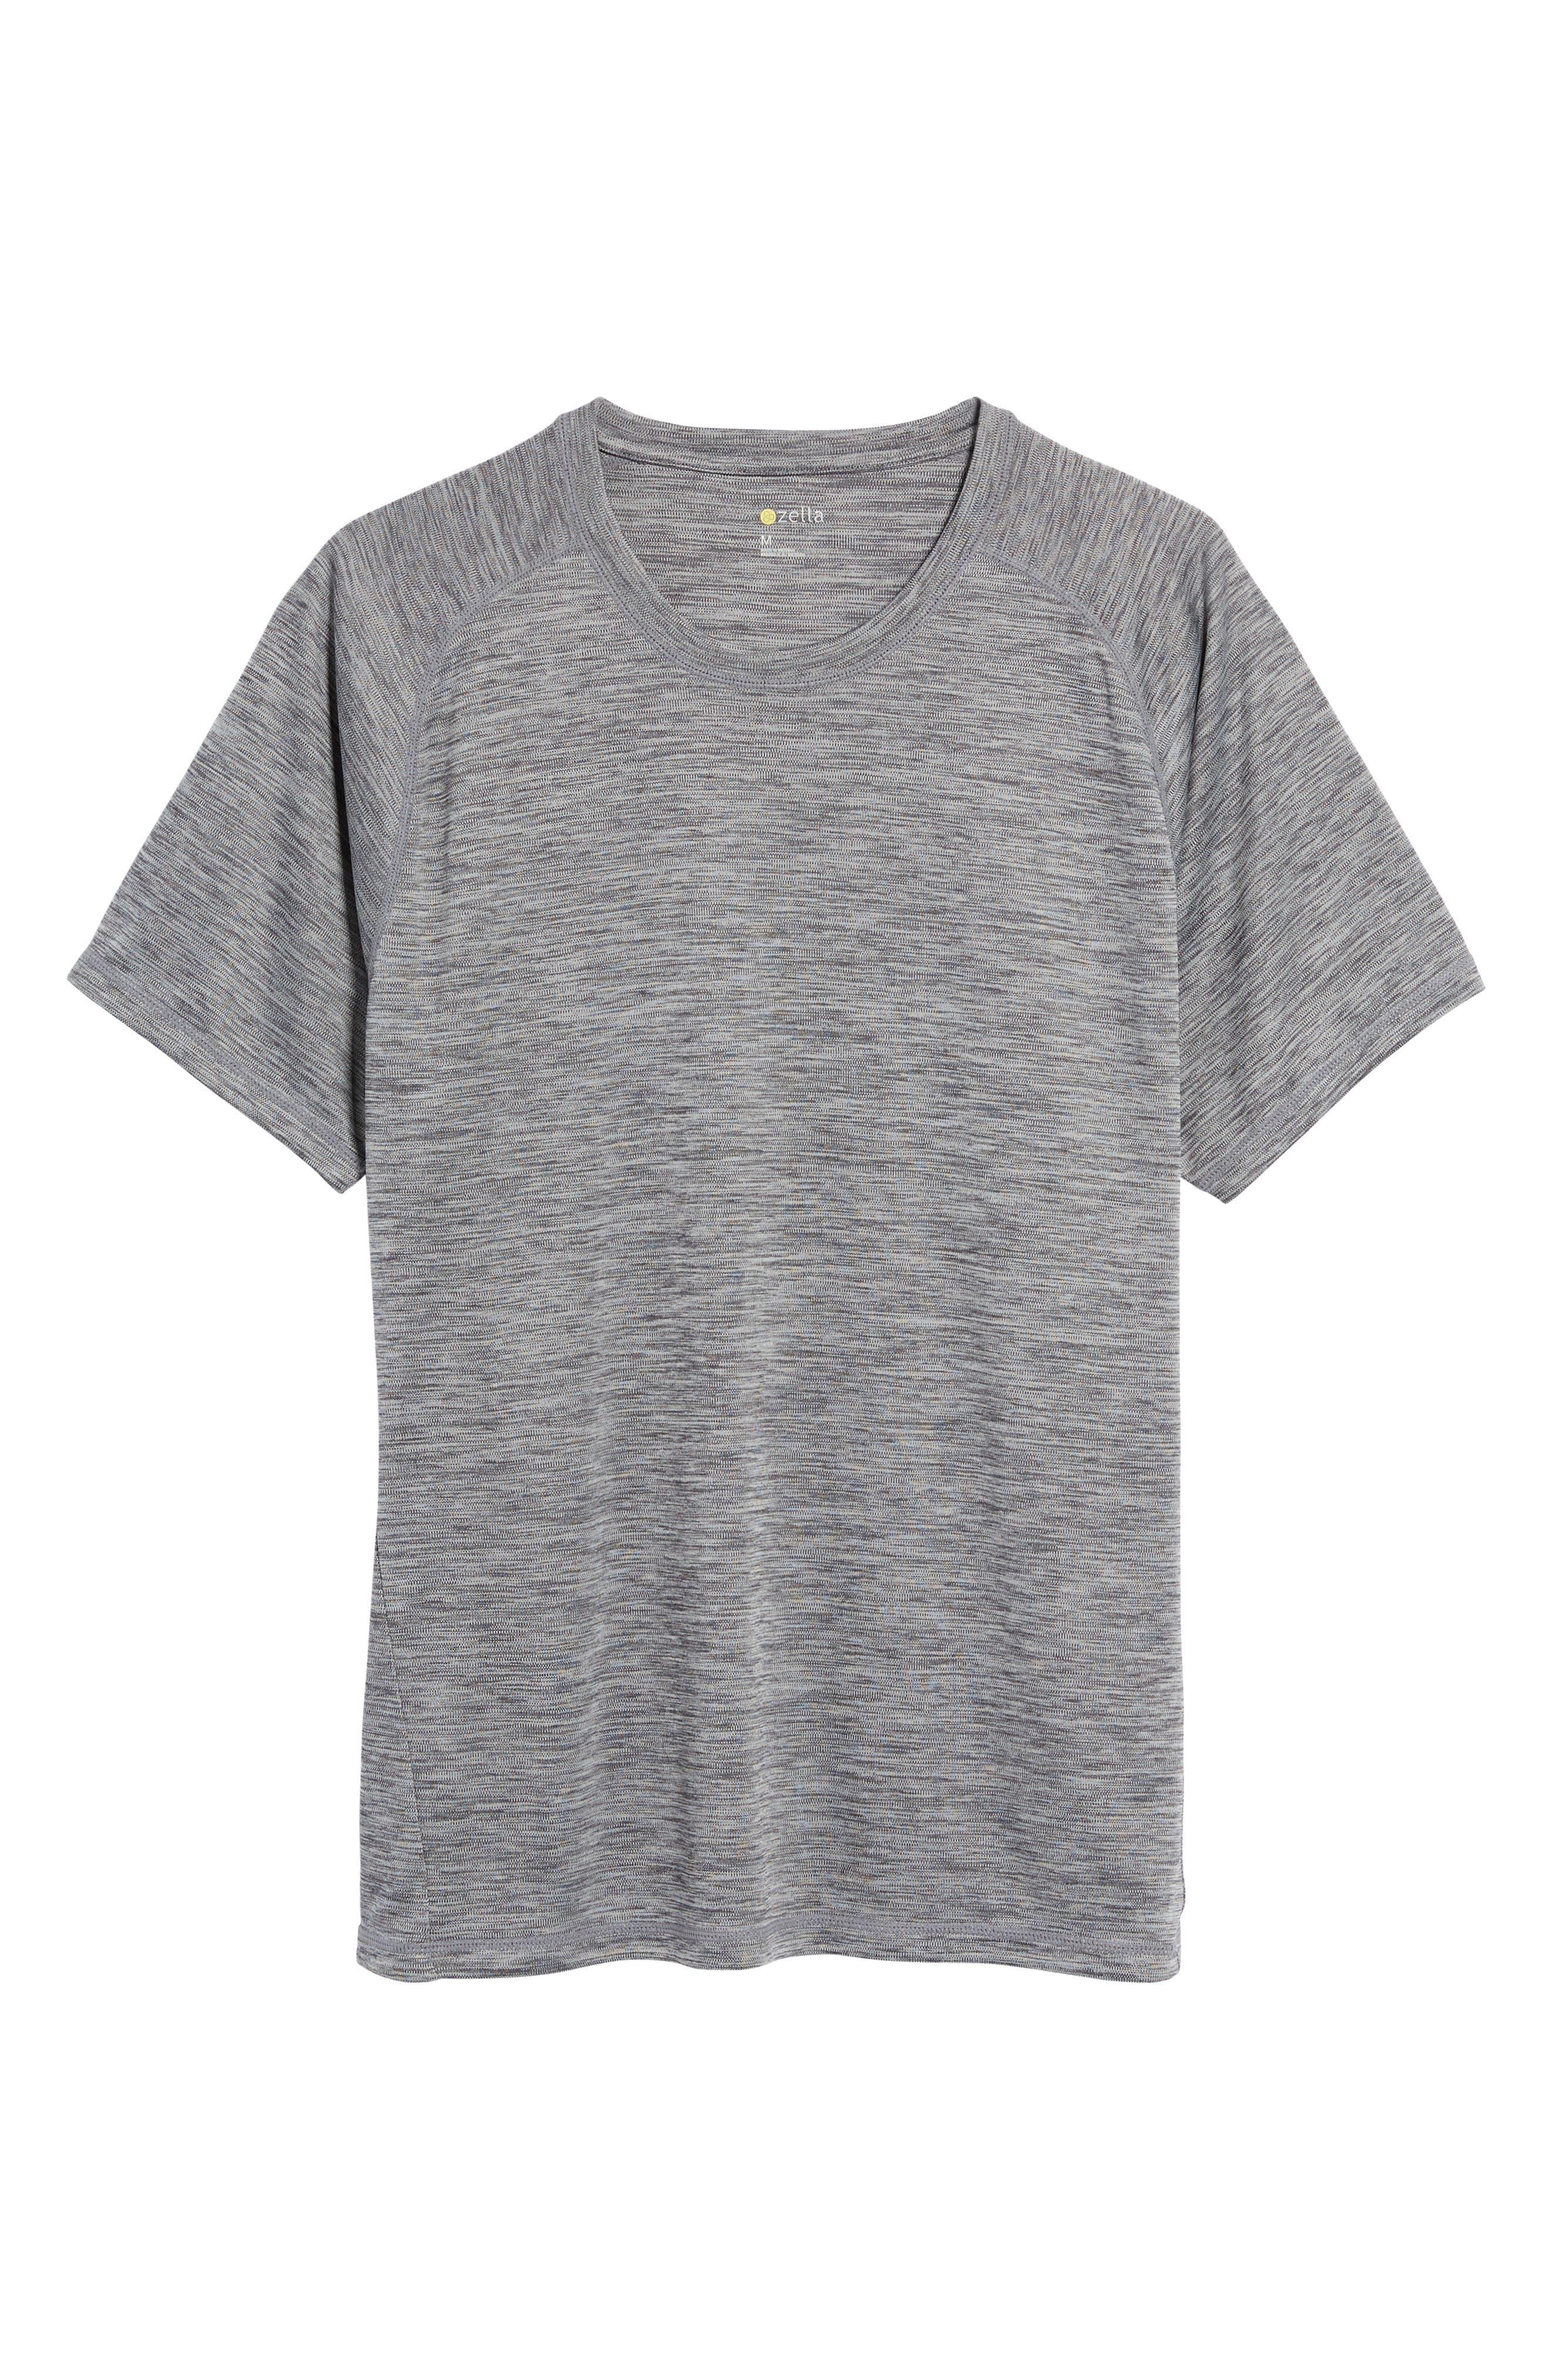 ZELLA,                             Triplite T-Shirt,                             Alternate thumbnail 6, color,                             050